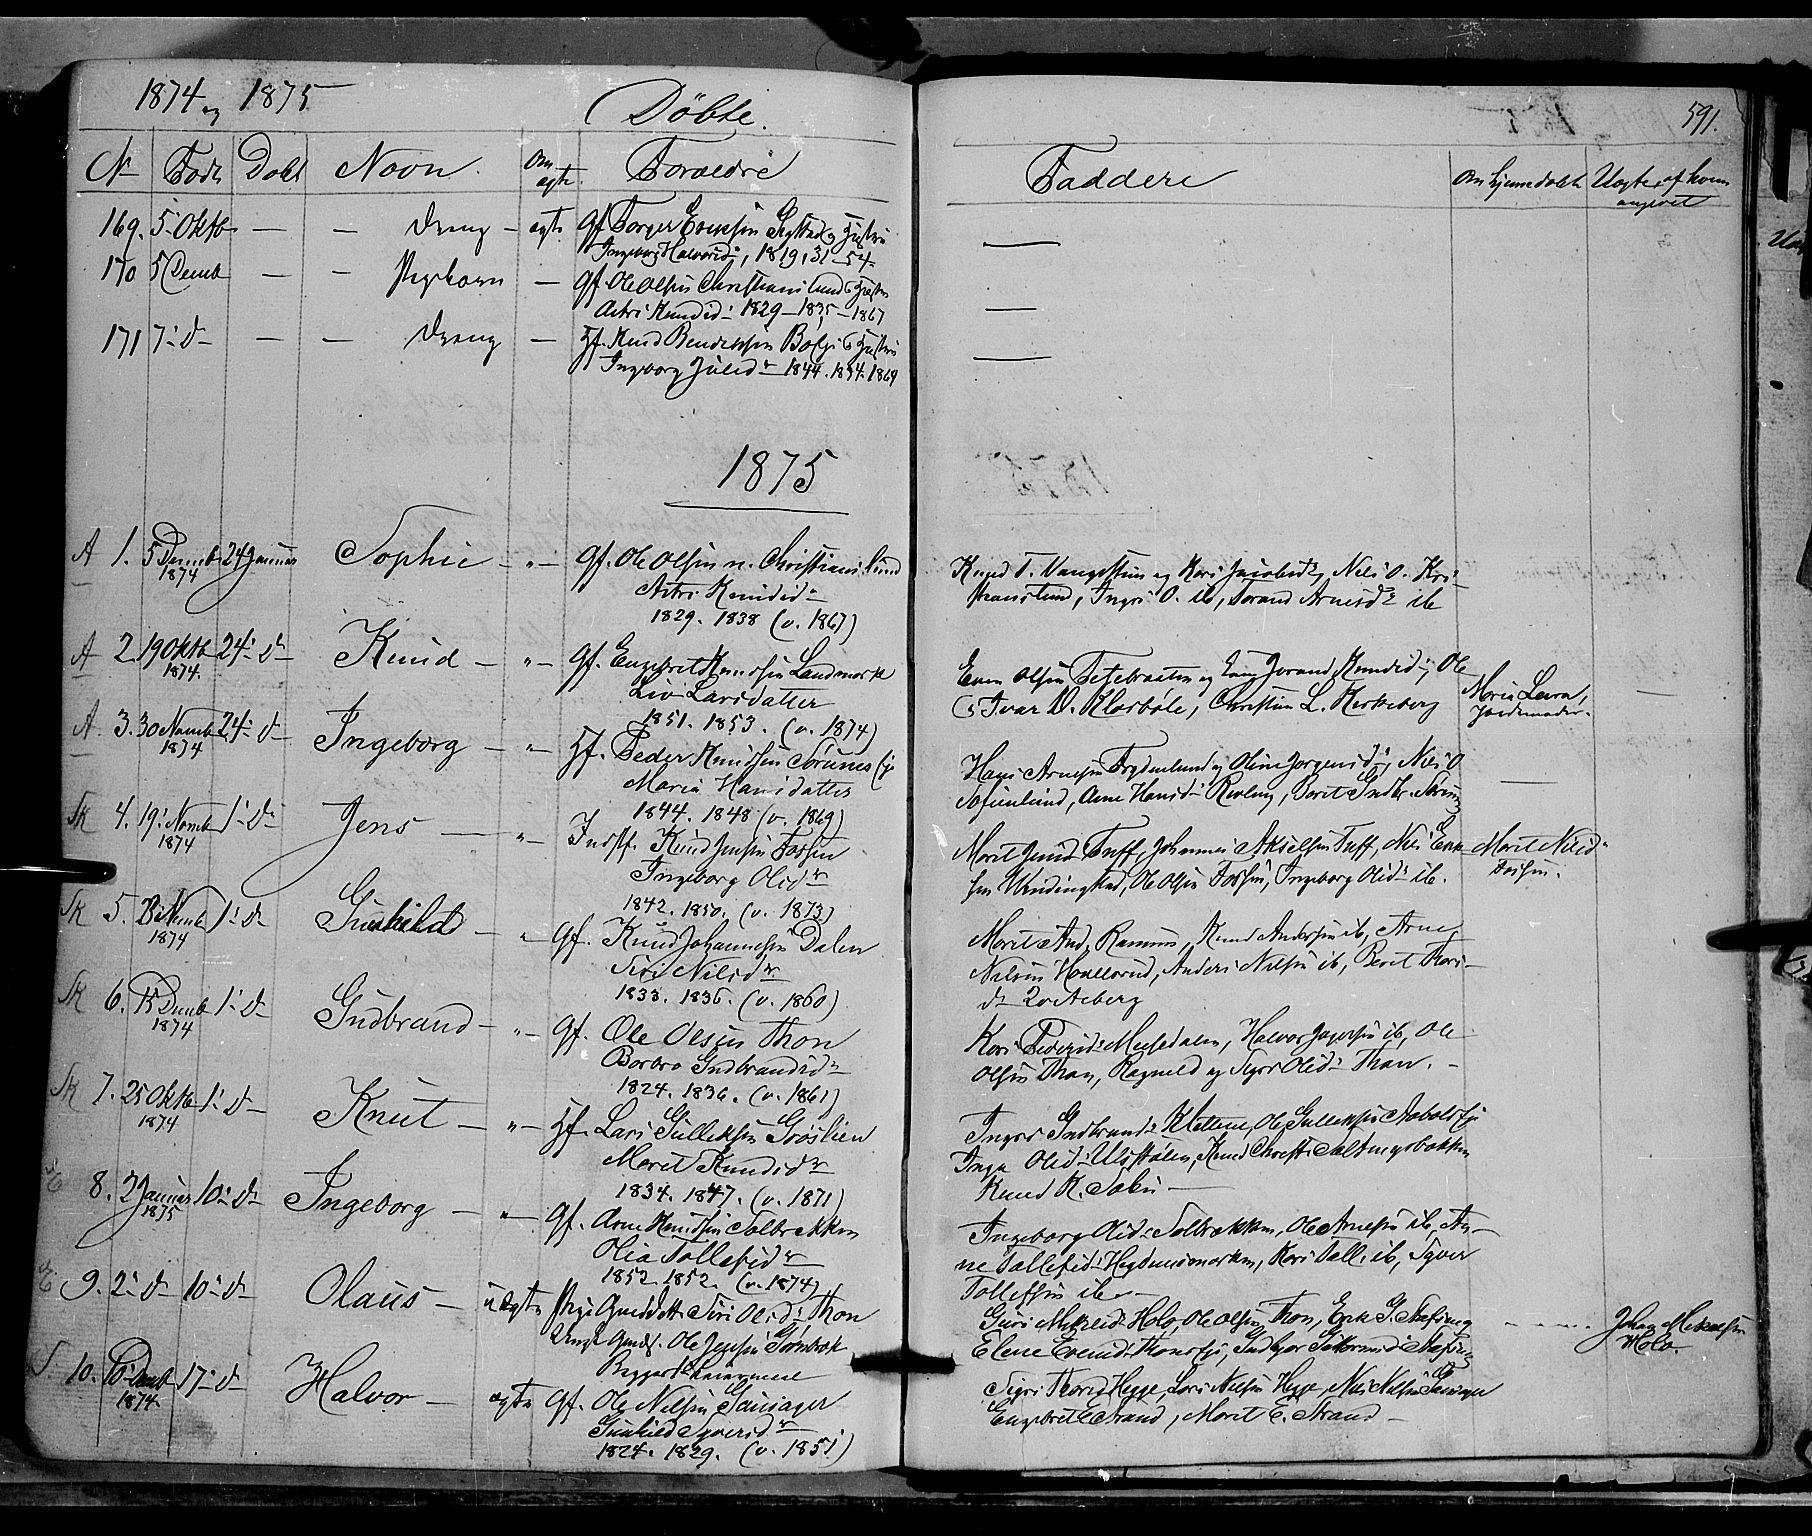 SAH, Nord-Aurdal prestekontor, Ministerialbok nr. 8, 1863-1875, s. 591